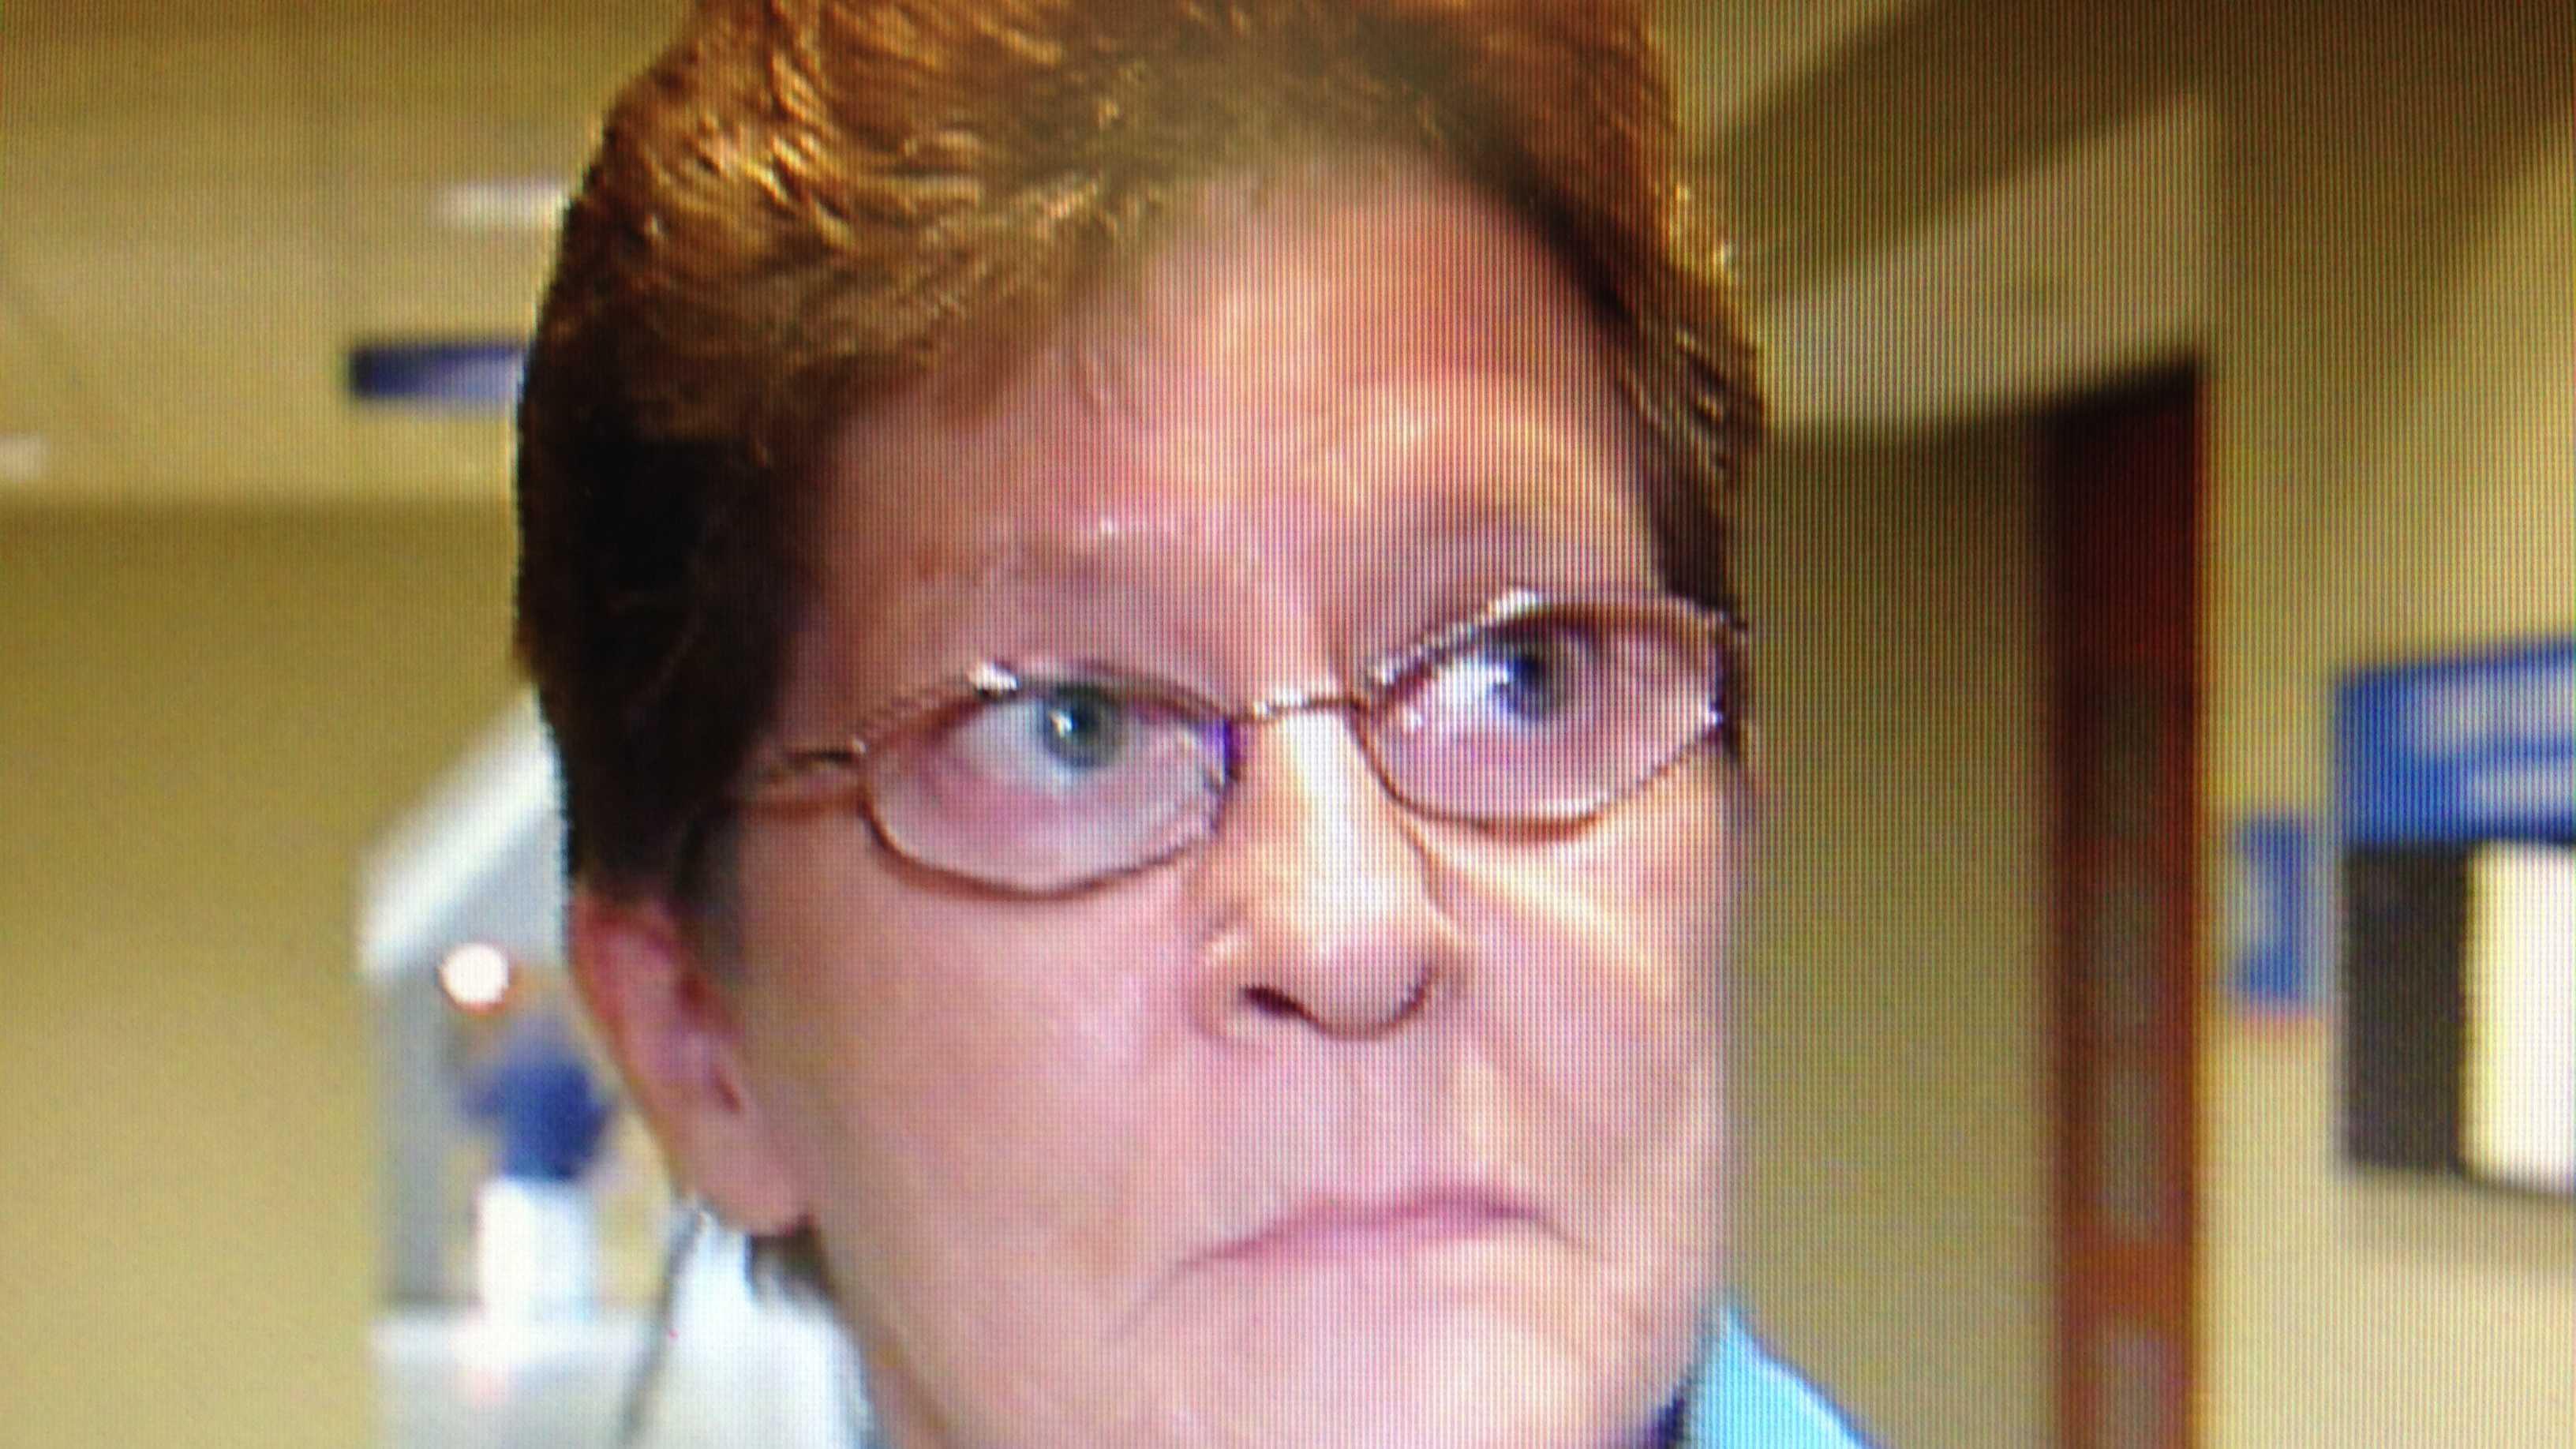 Linda Gadapee, of East Haven, Vermont, spoke after Allen Prue's conviction for the murder of her niece, Melissa Jenkins.